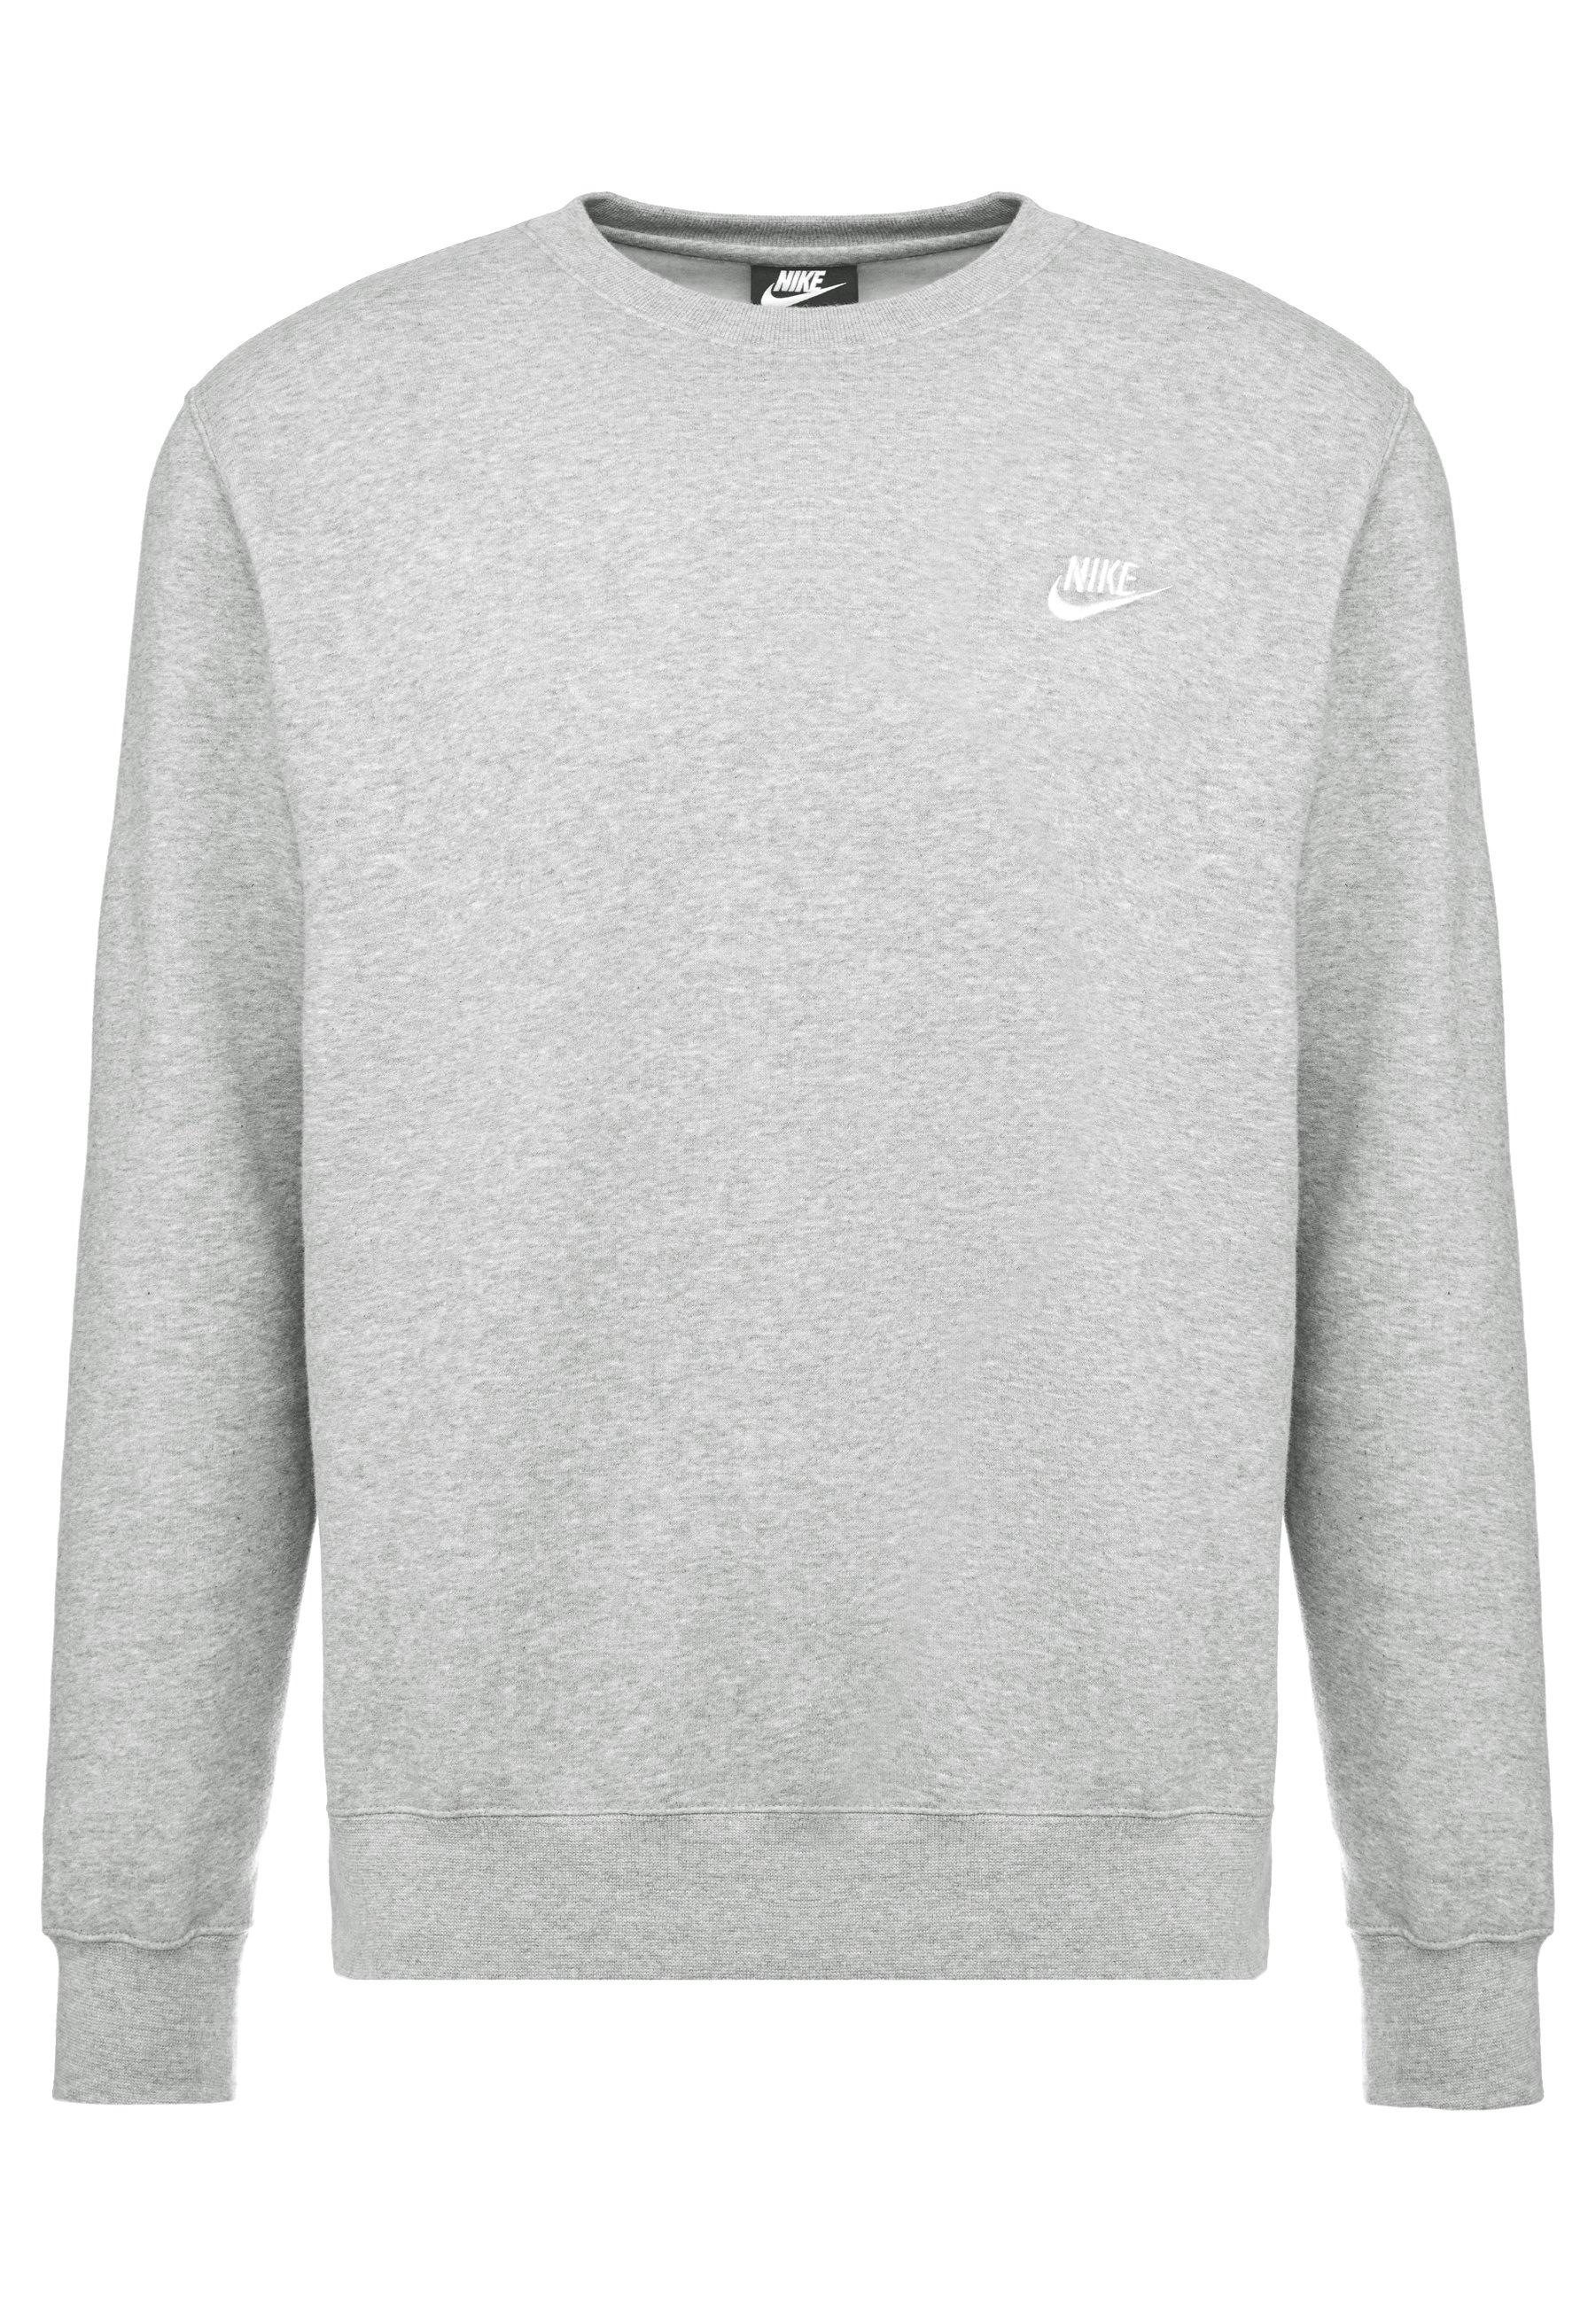 CLUB Sweatshirt grey heatherwhite